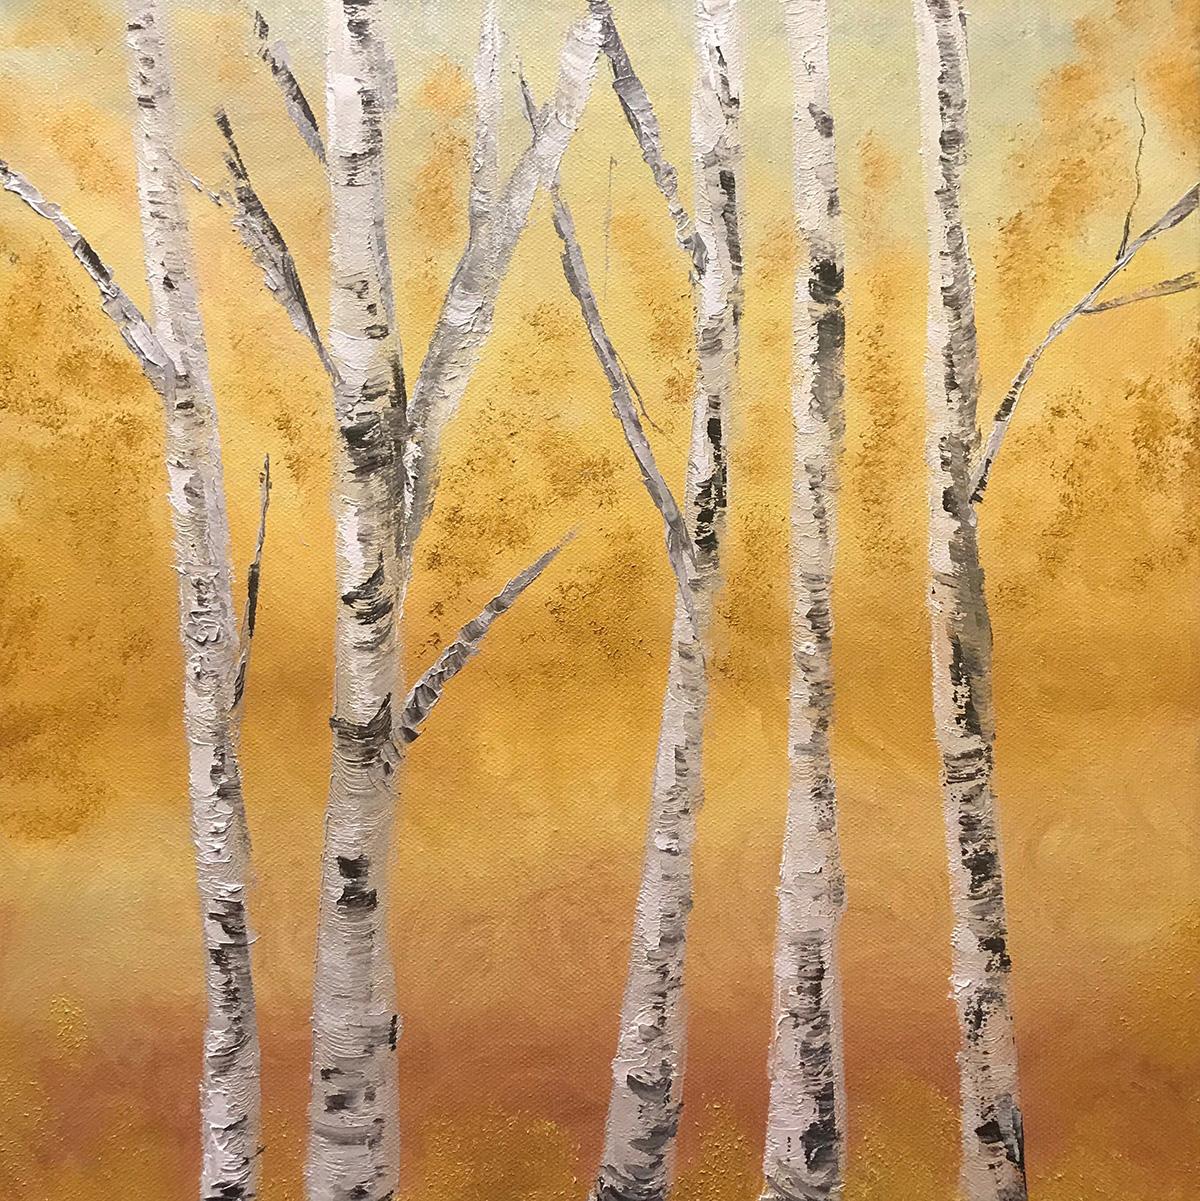 Fabiana Walsh - Birches - Oil on canvas